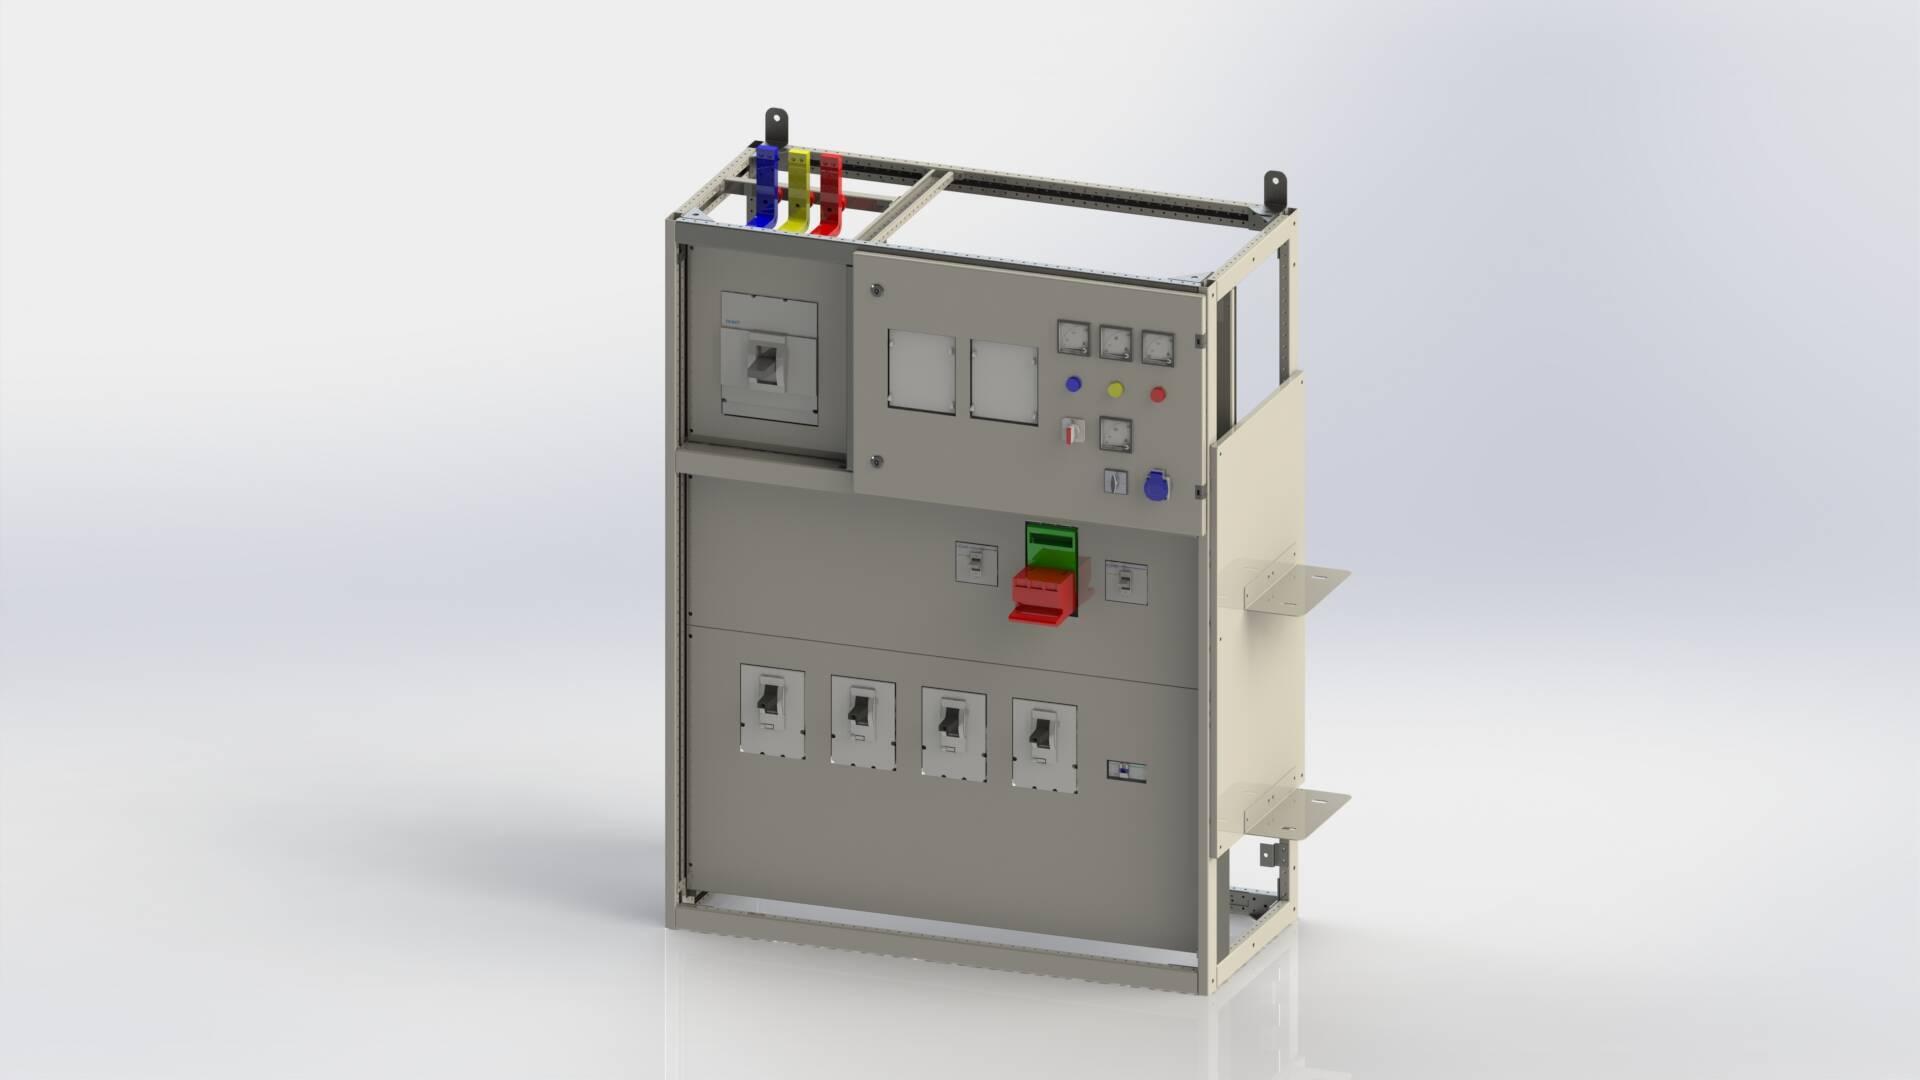 LPK-Low Voltage Panel For Kiosk